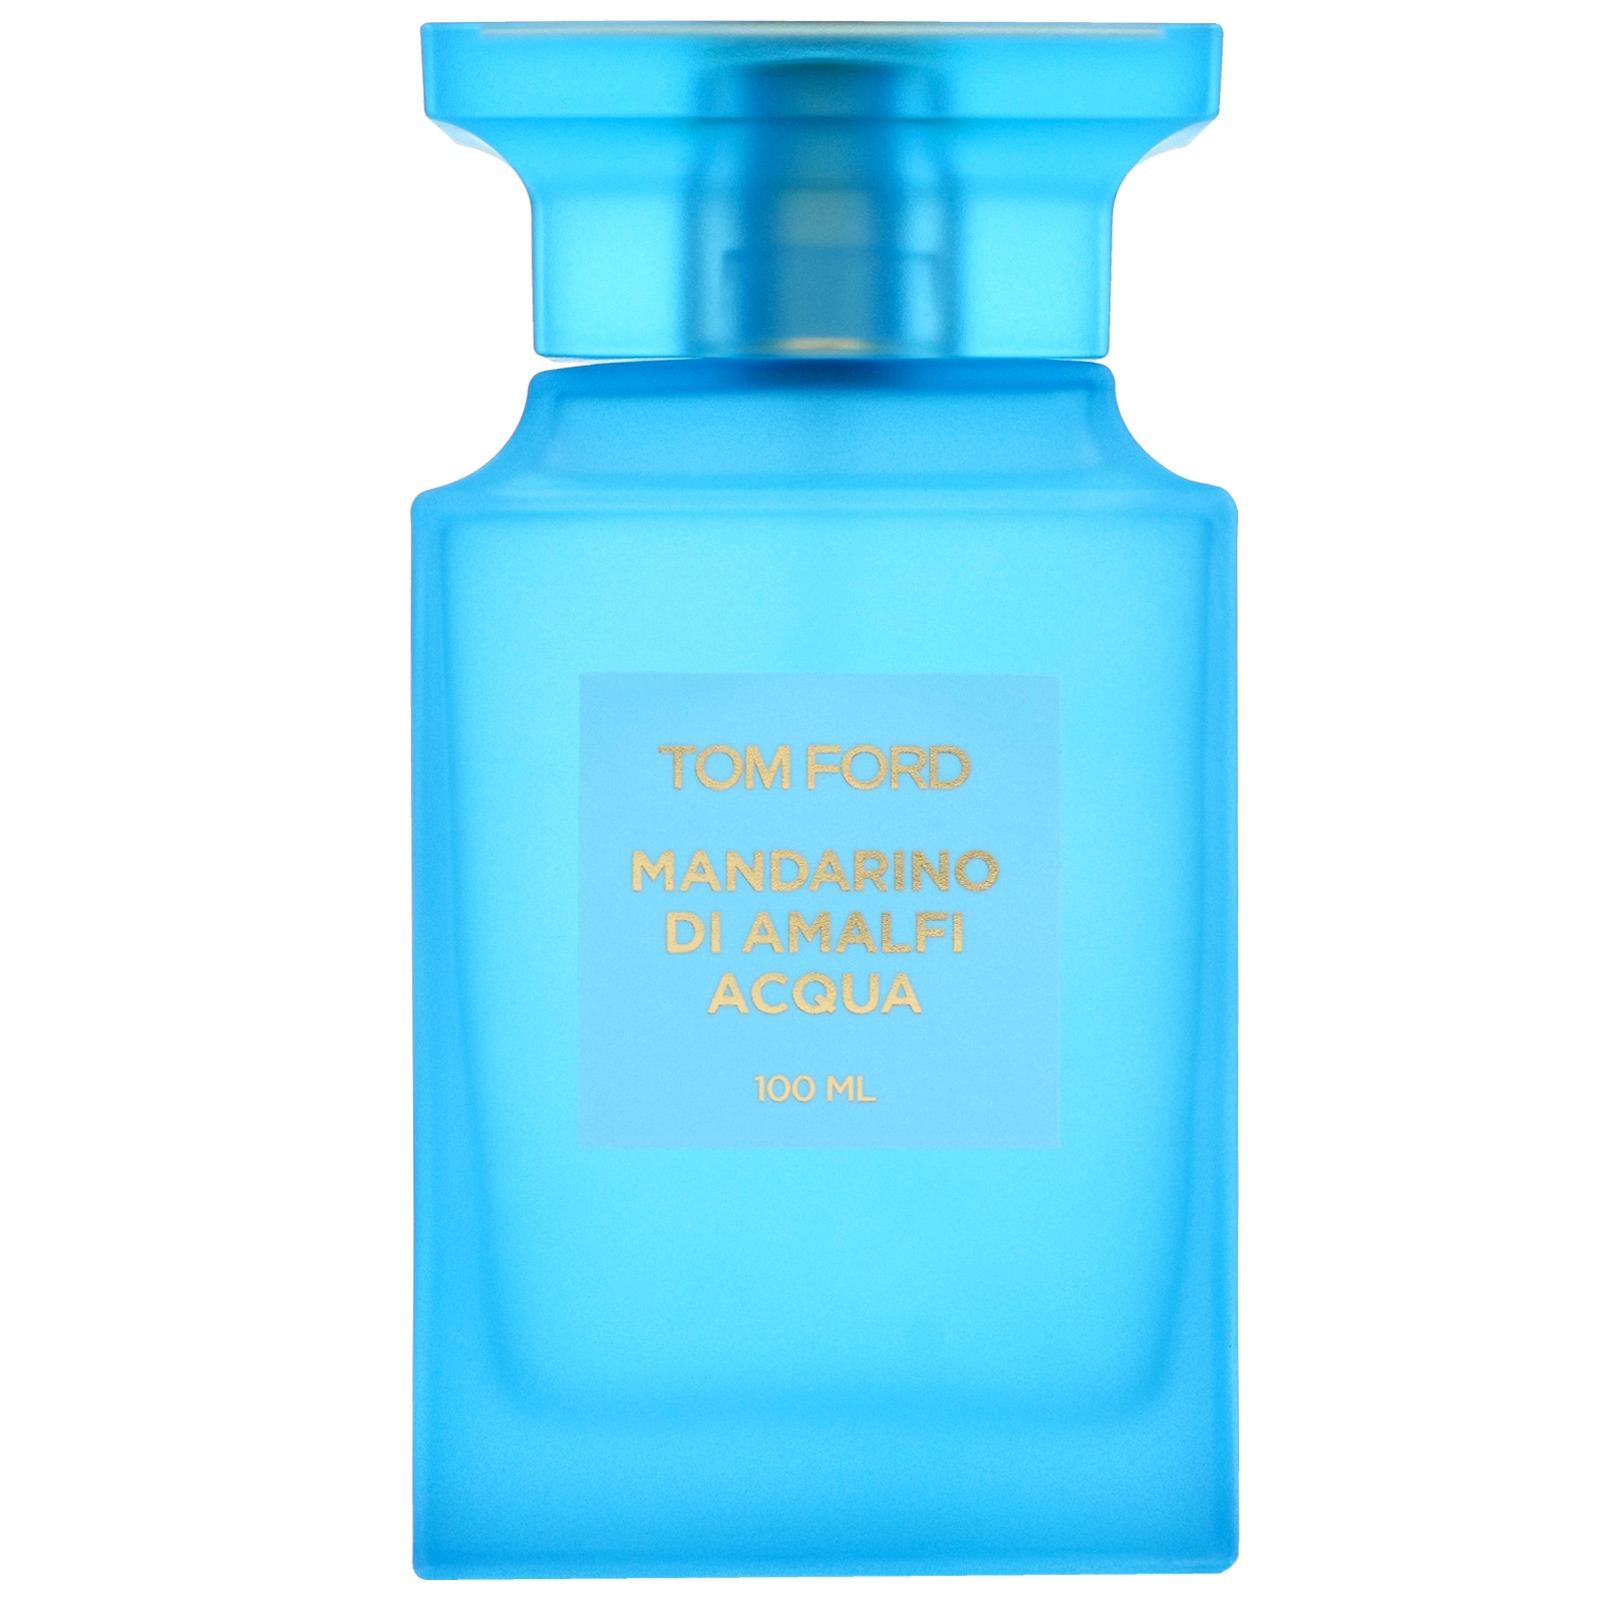 Tom Ford Mandarino di amalfi acqua 100ml - £84 @ All beauty